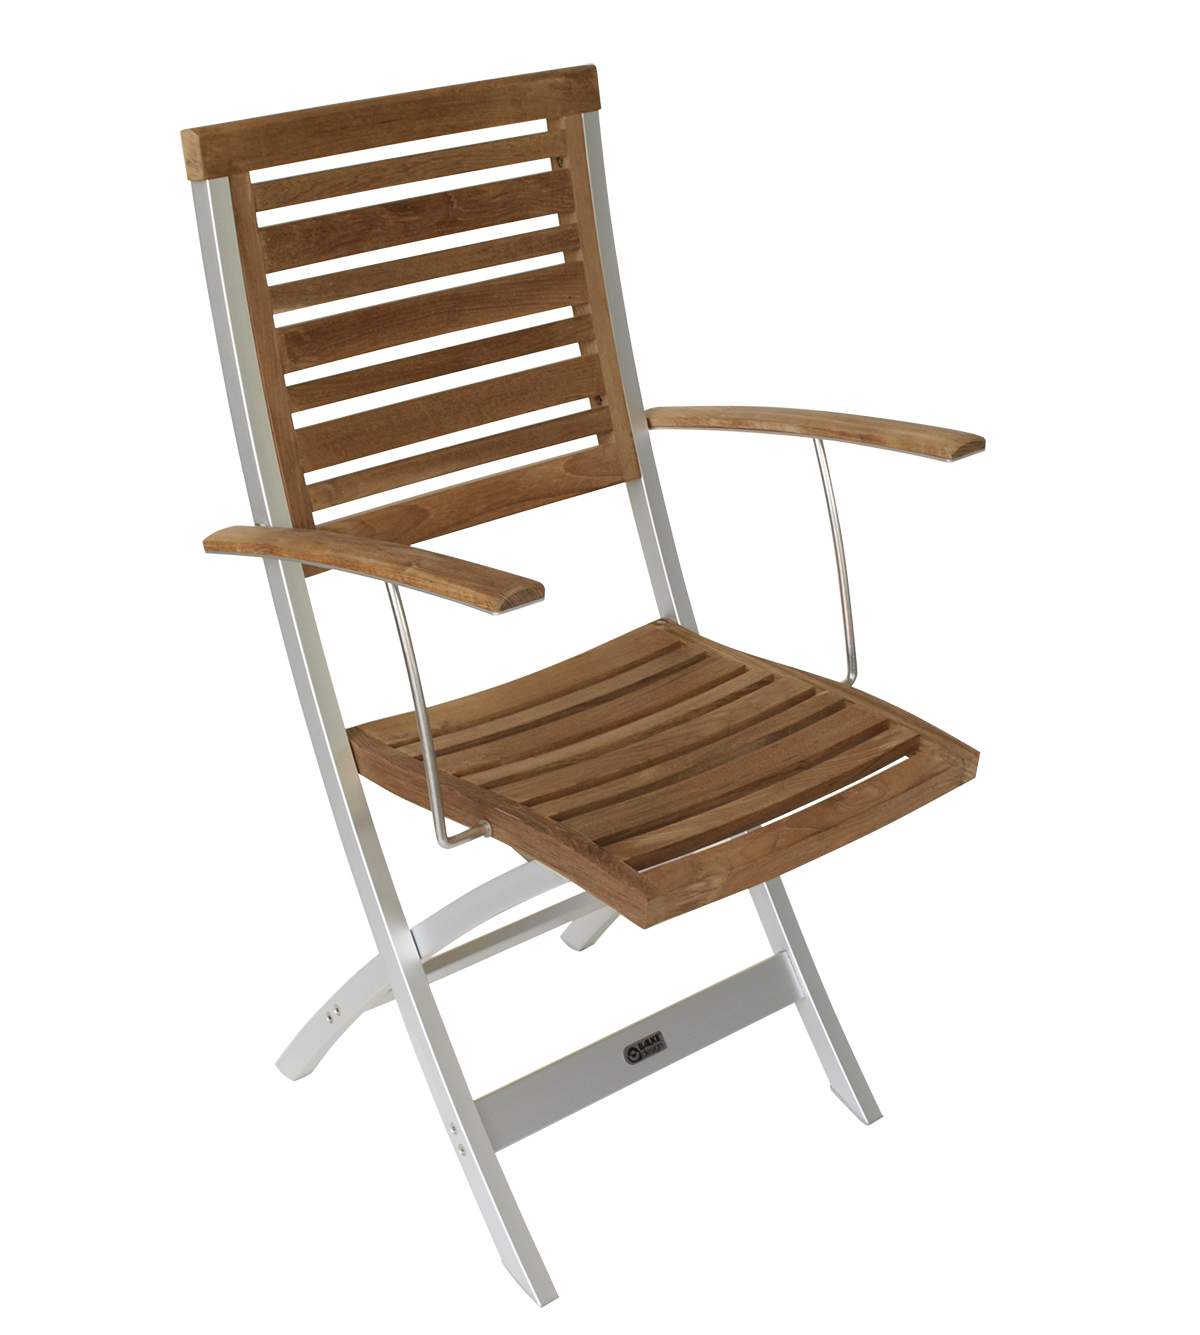 luxus armlehnenstuhl klappsessel venezuela von balke alu aluminium teakholz ebay. Black Bedroom Furniture Sets. Home Design Ideas